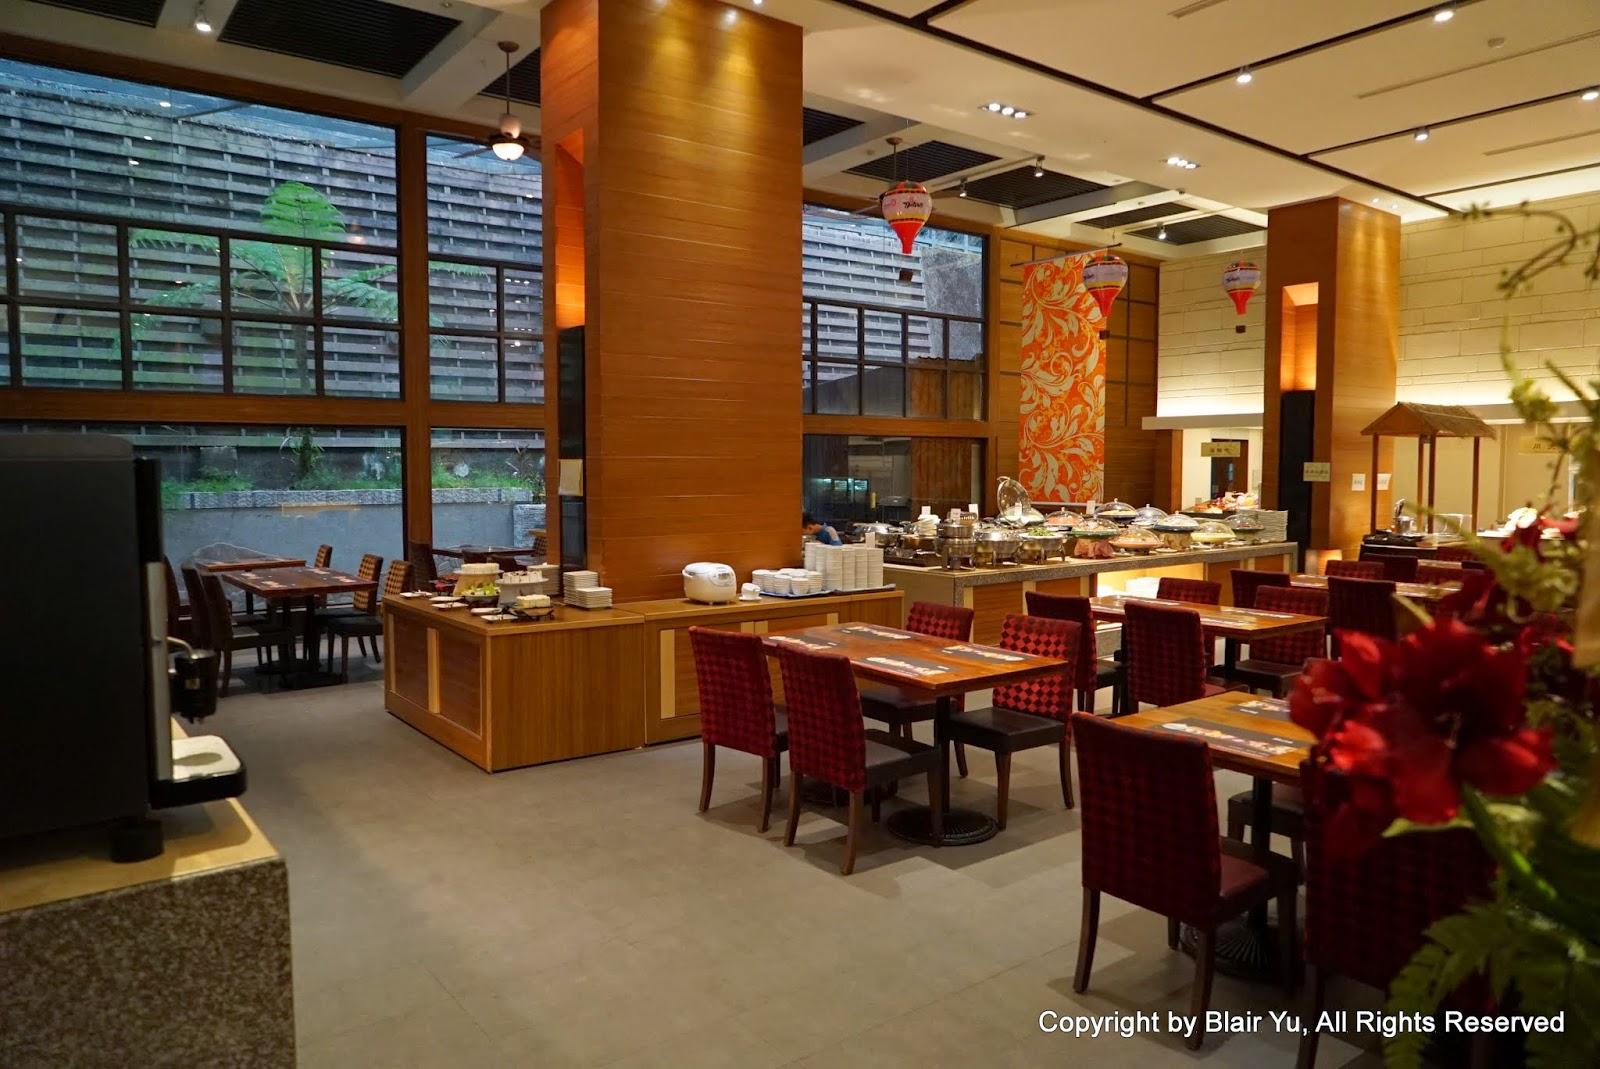 Blair and Kate's 旅遊與美食: 知本 富野溫泉休閒會館 Part 2: 餐廳篇